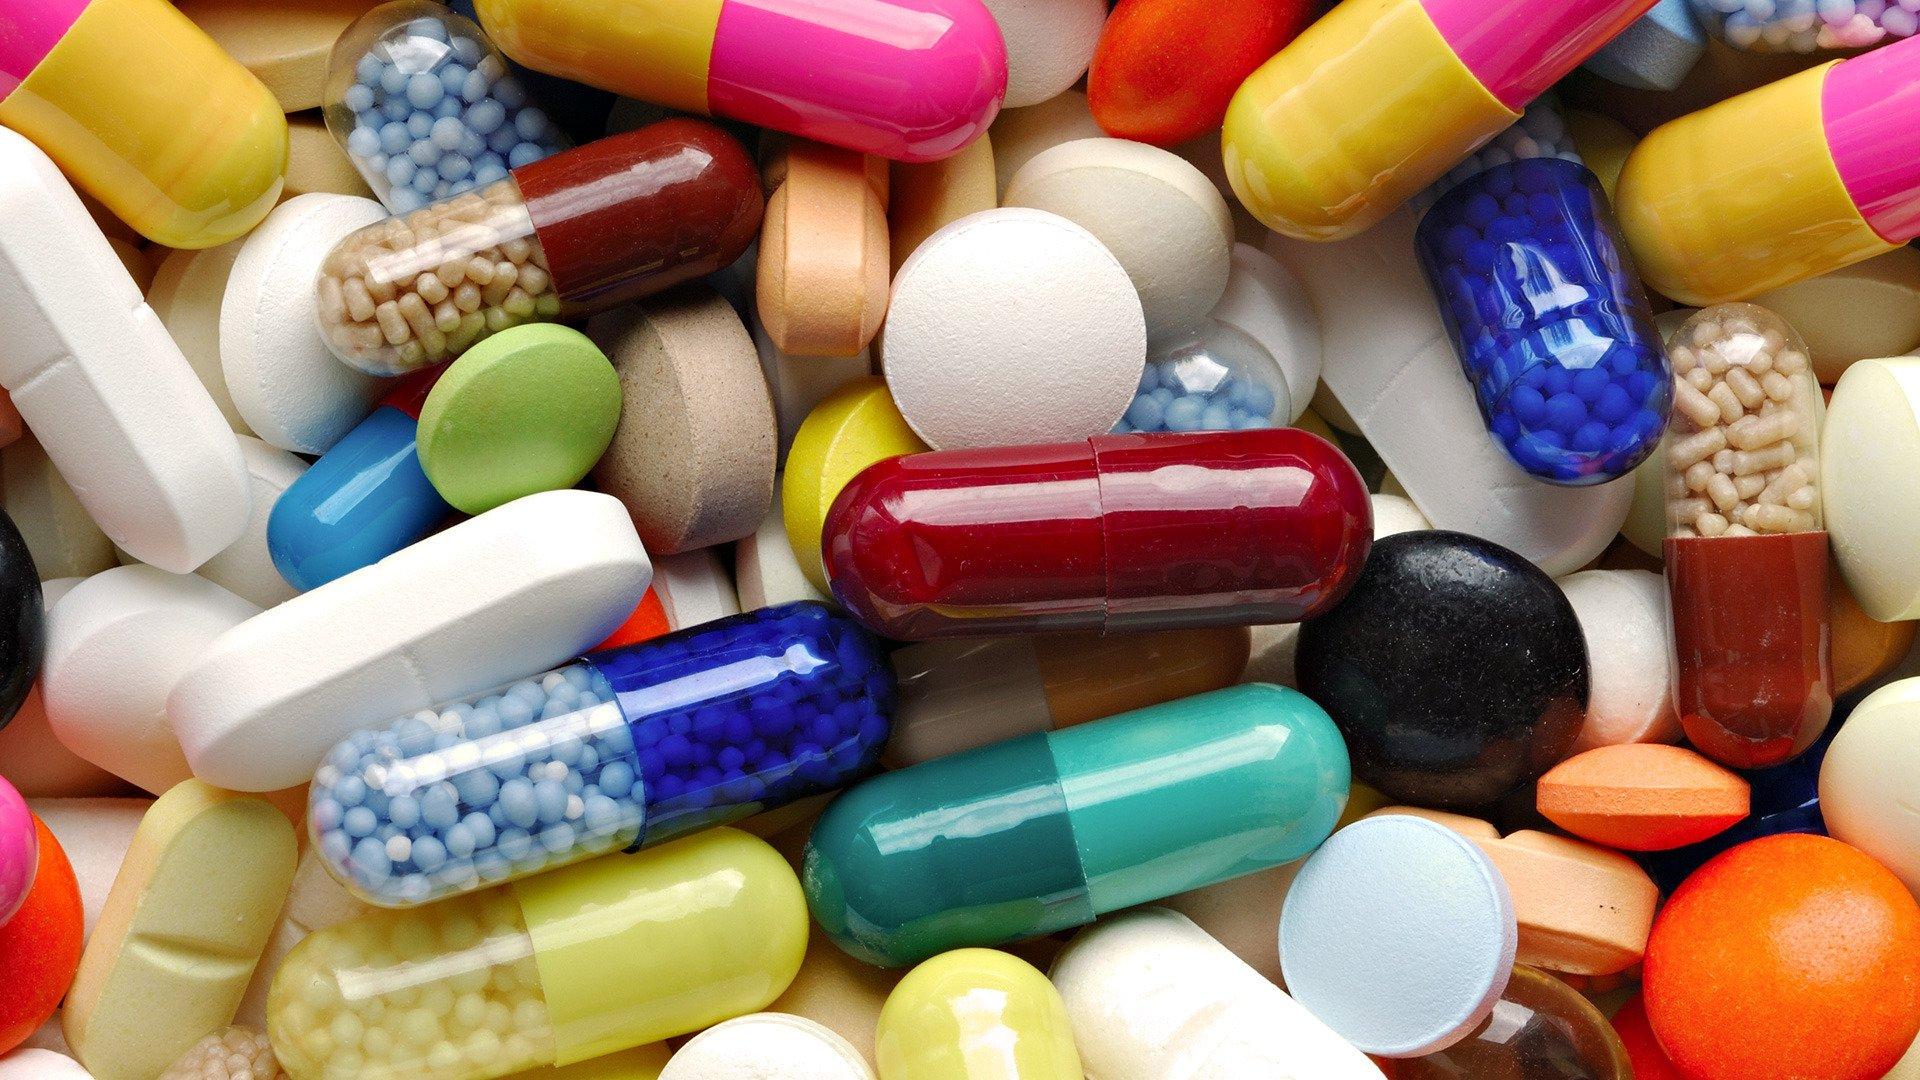 92 medicines price cut down